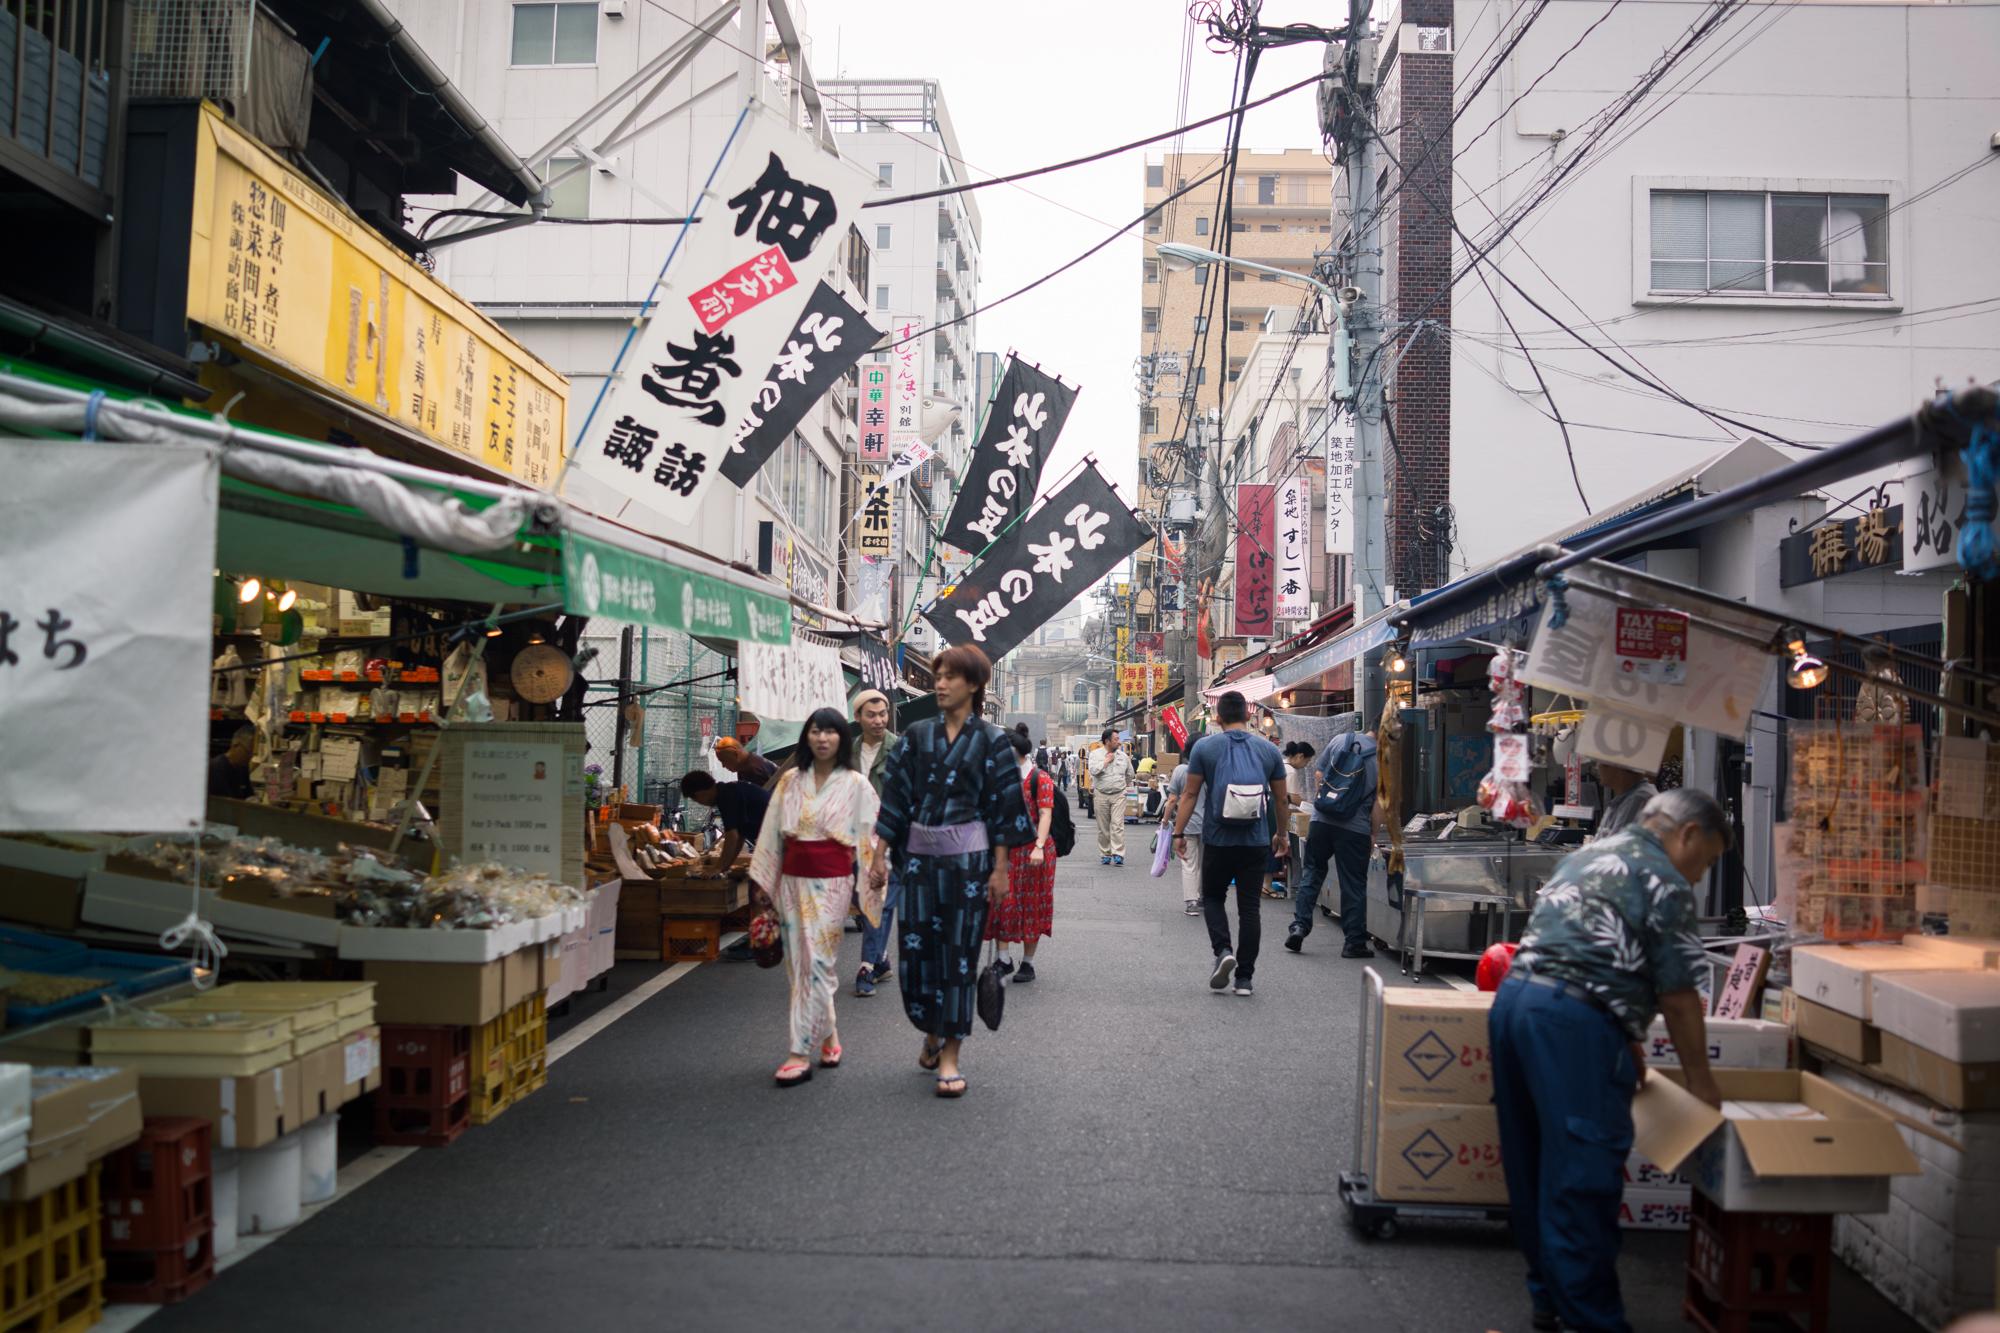 Streets Surrounding Tsukiji Fish Market